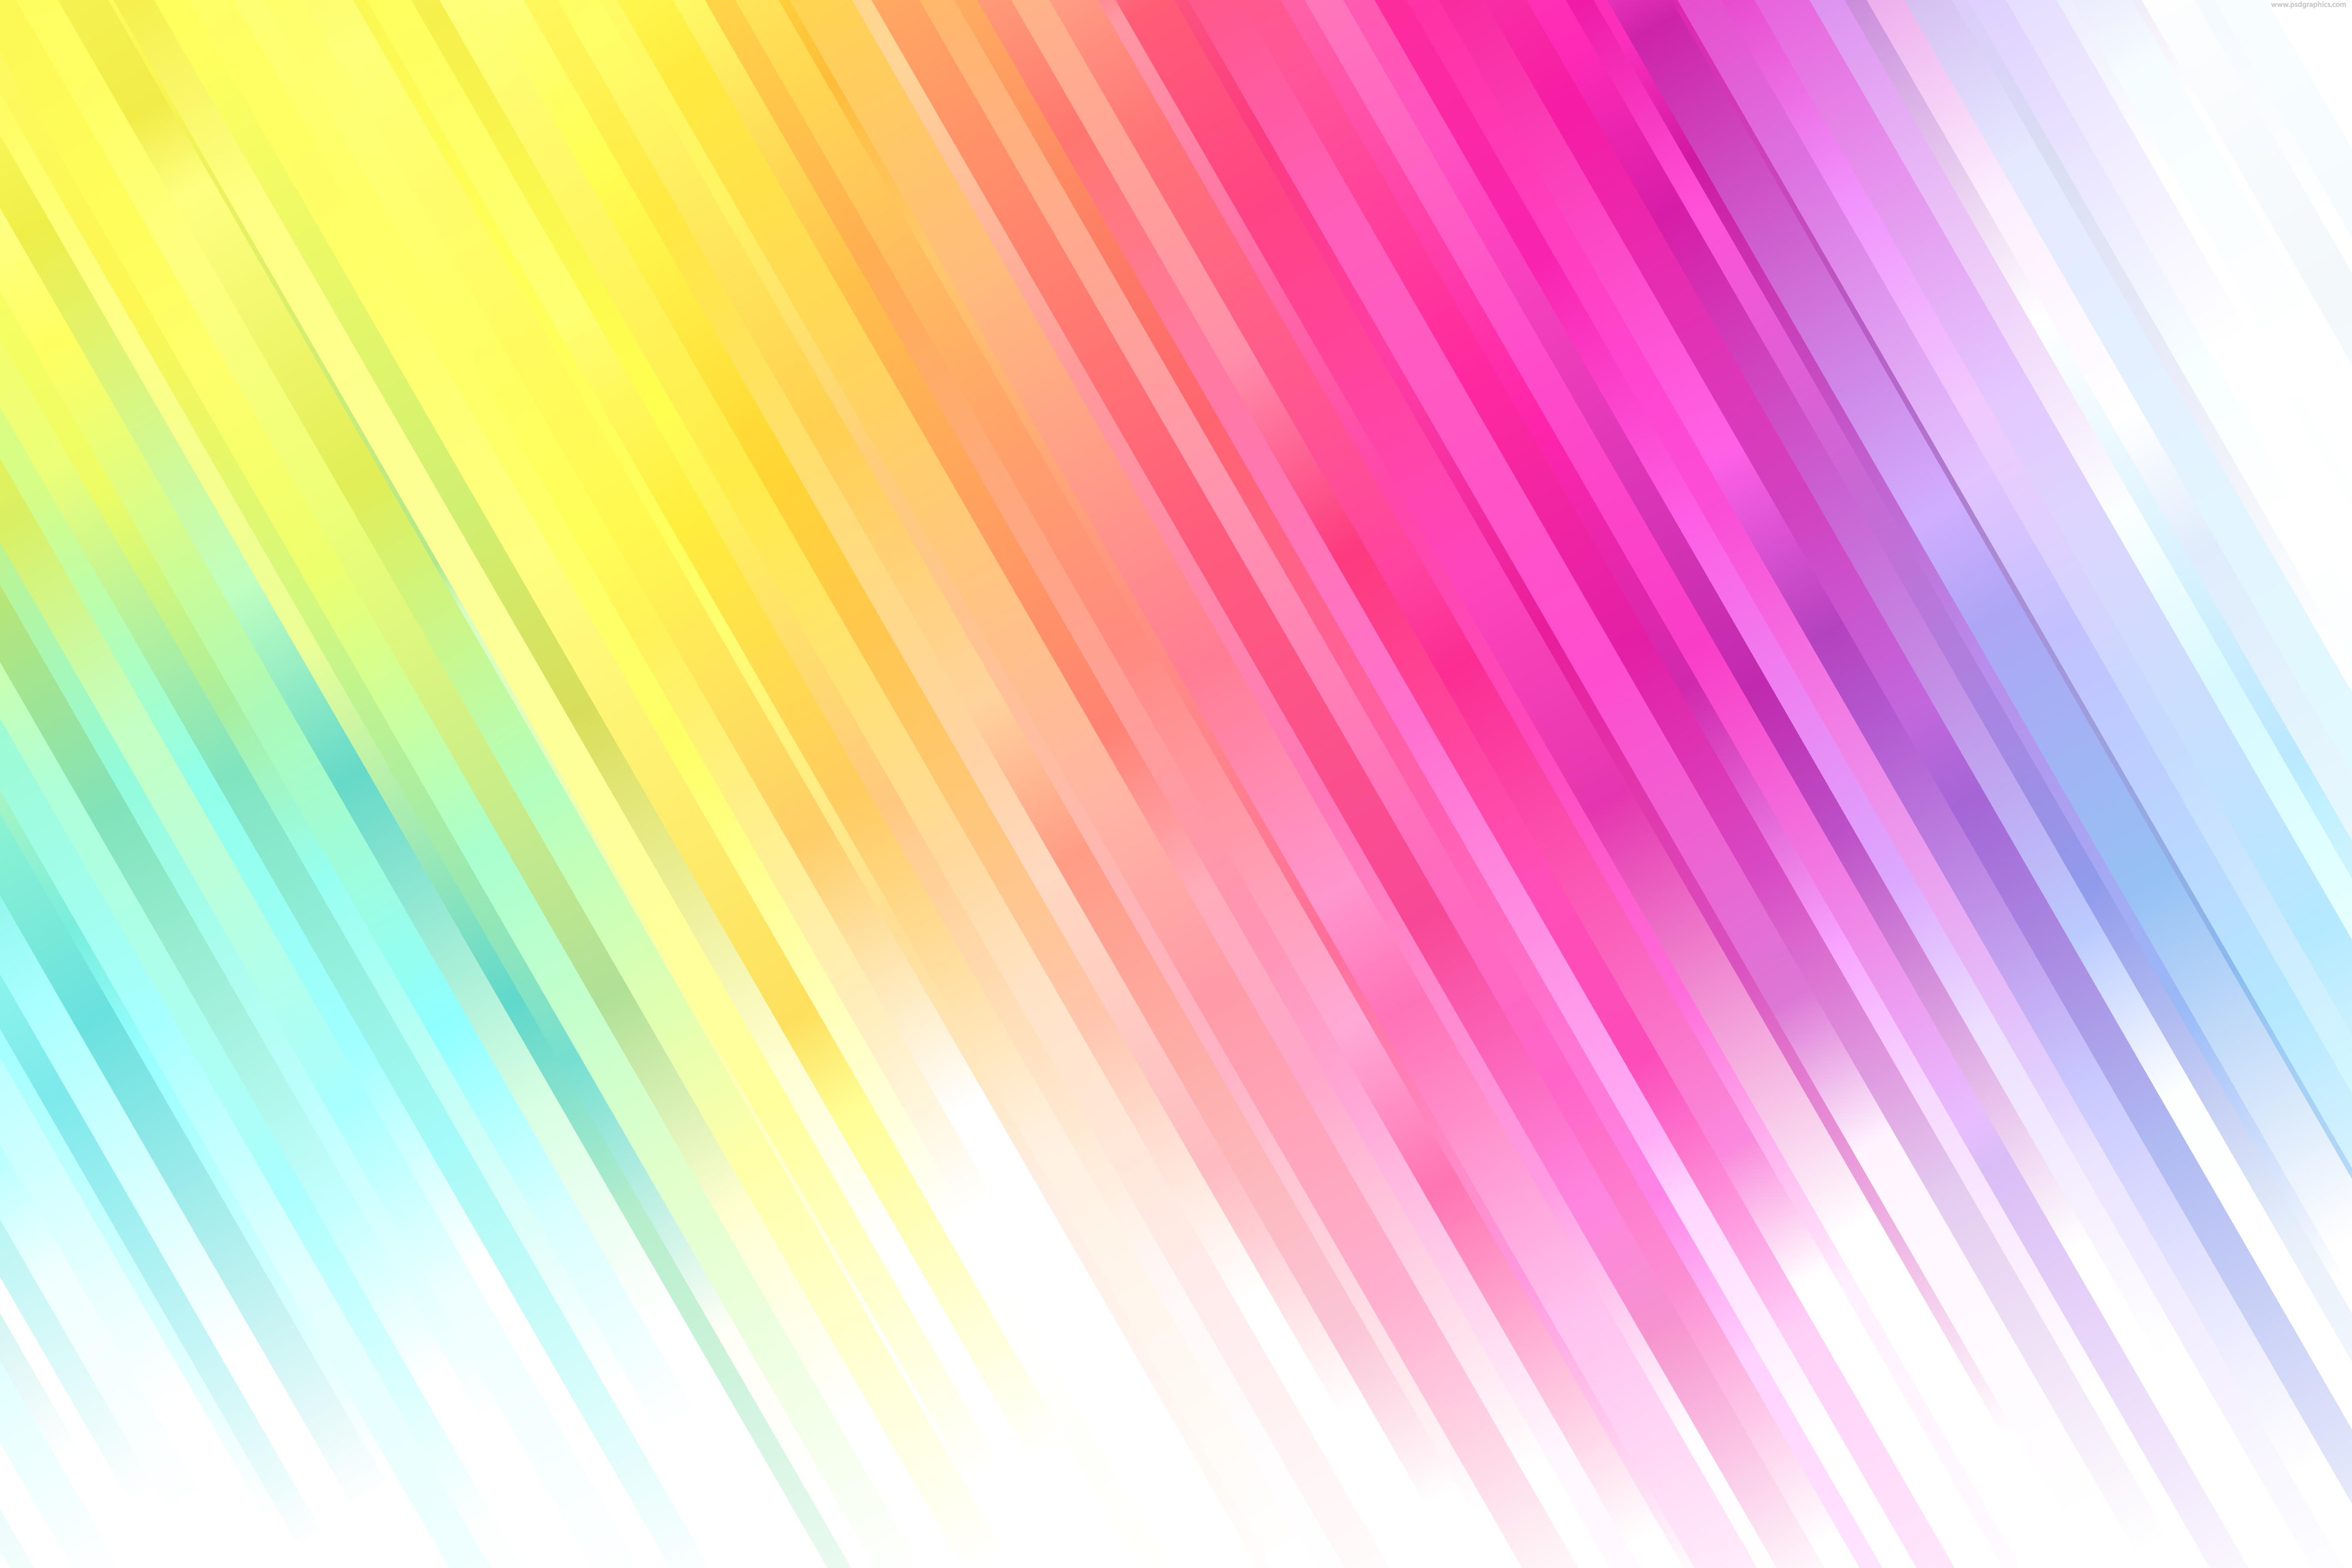 Summer Desktop Wallpaper Hd Colorful Stripes Vector Decoration Psdgraphics